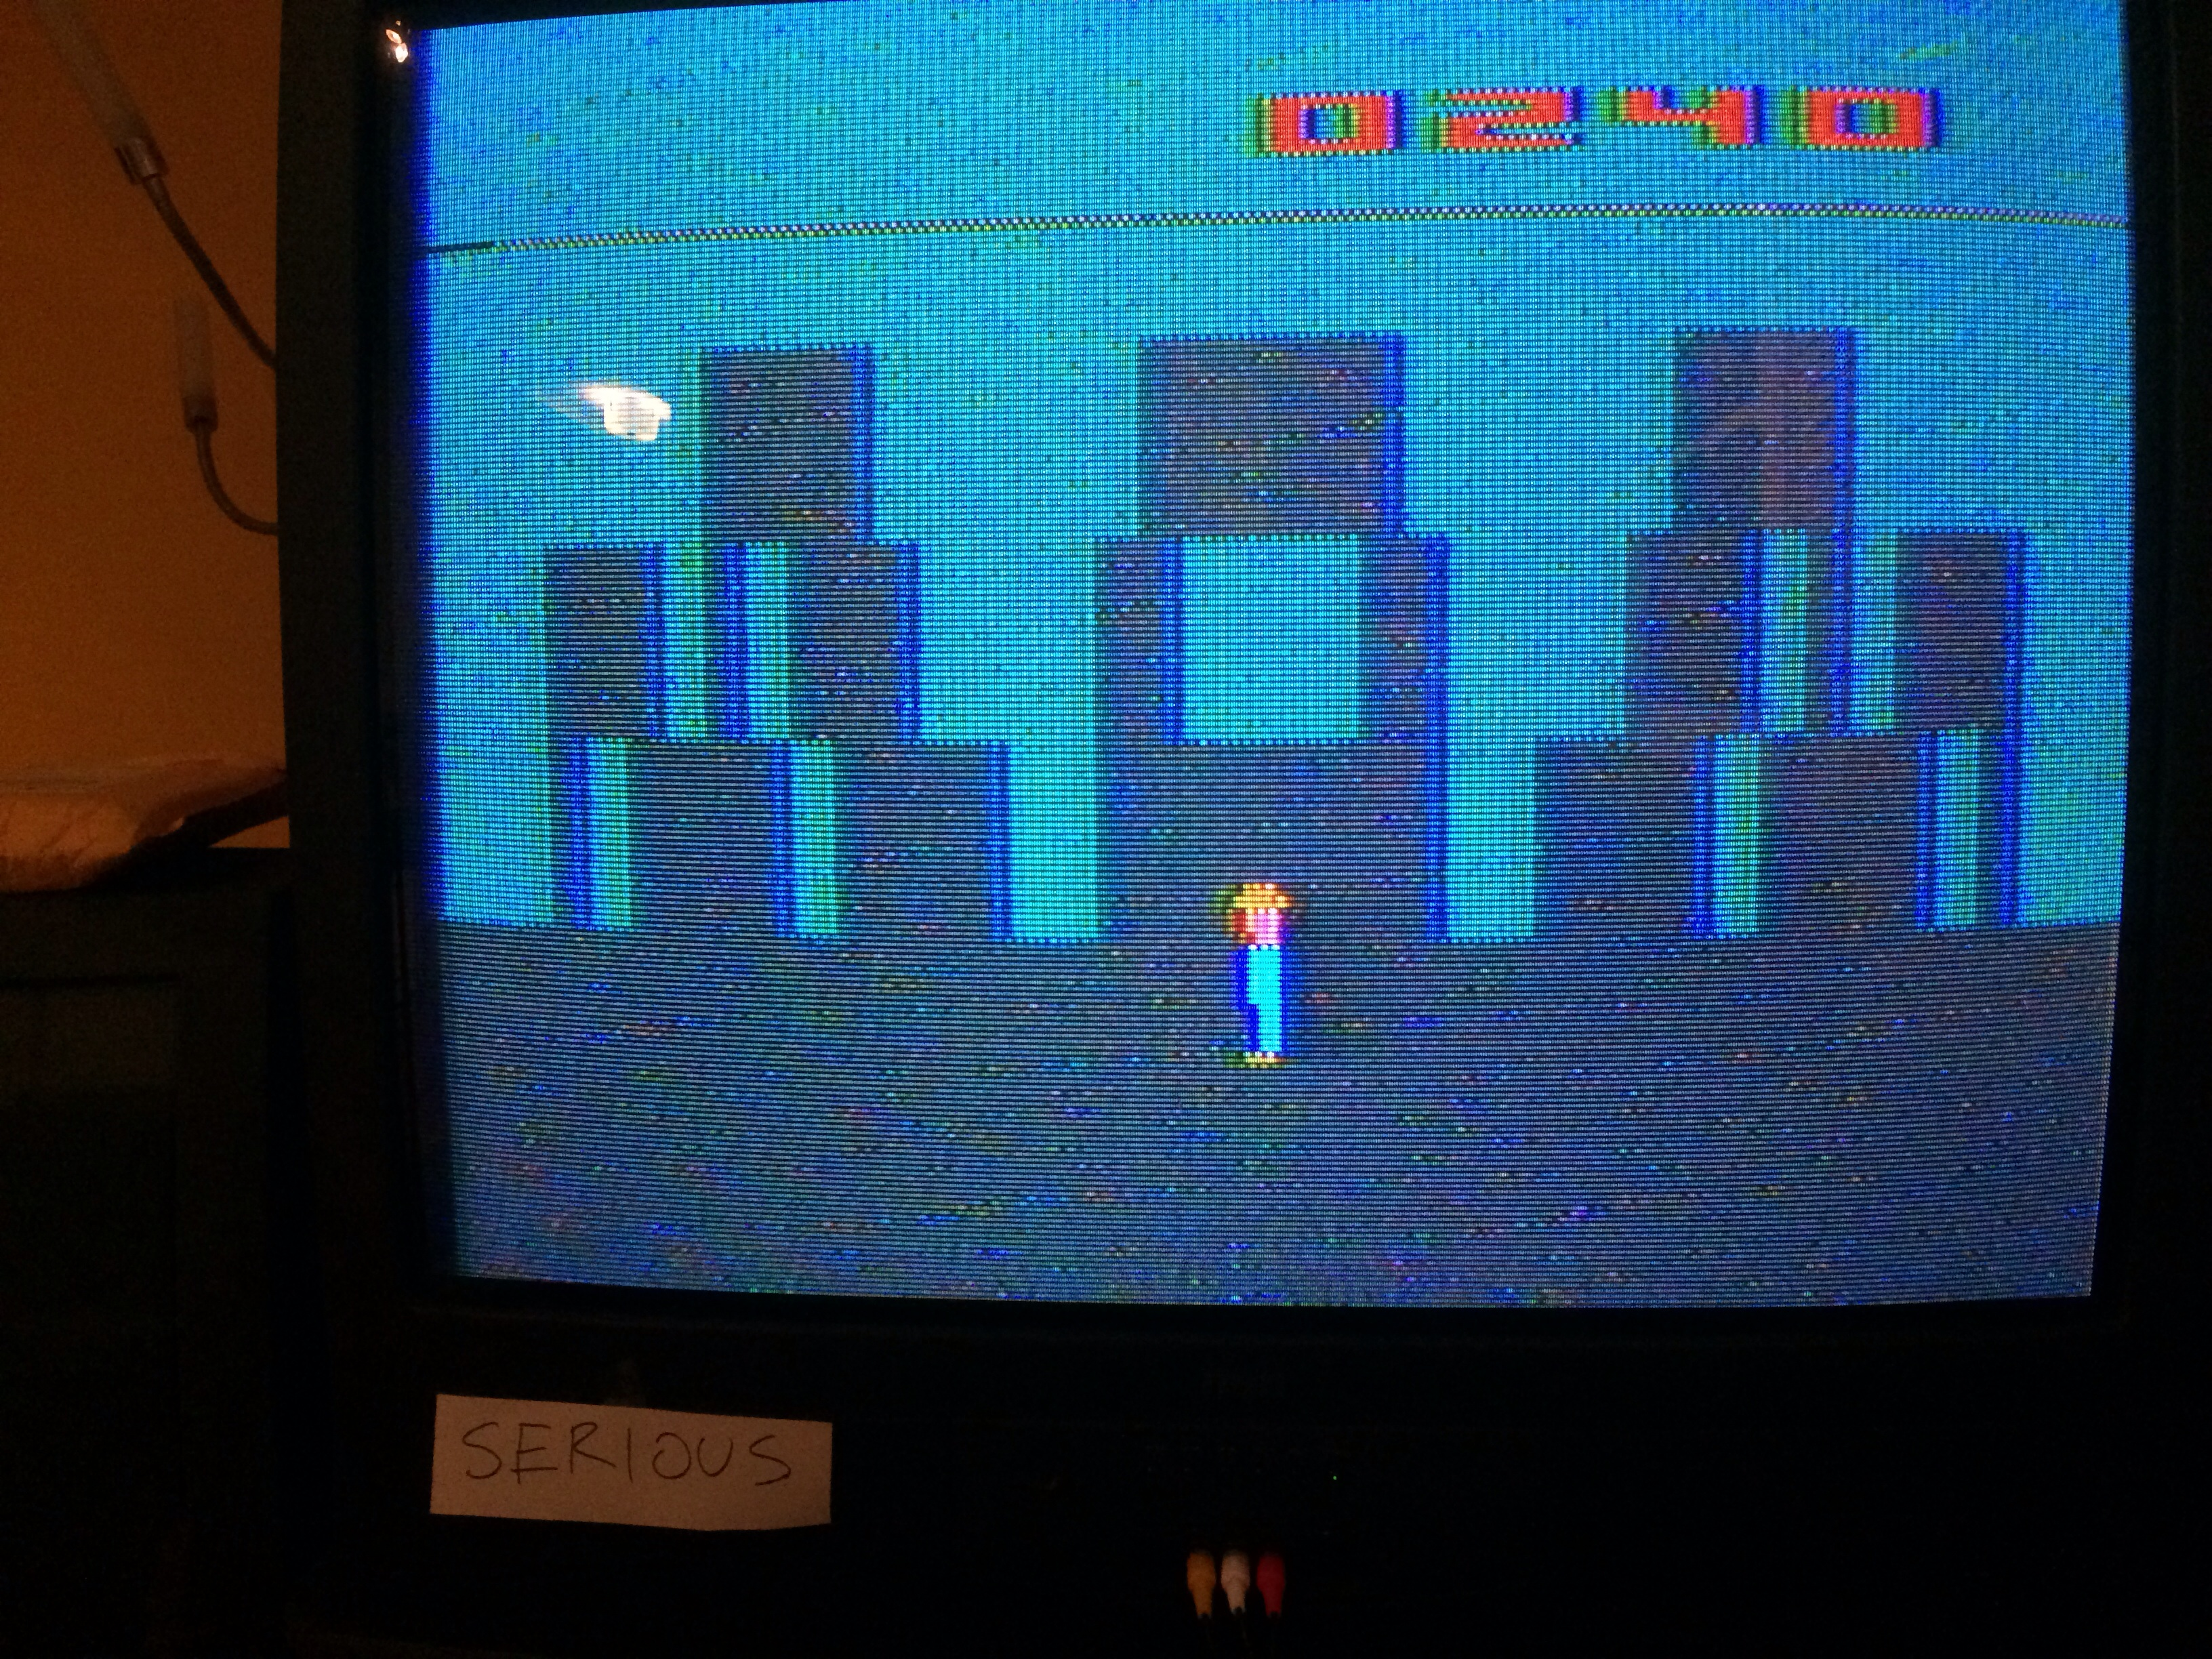 Serious: Superman (Atari 2600 Novice/B) 0:02:40 points on 2014-12-03 03:07:39